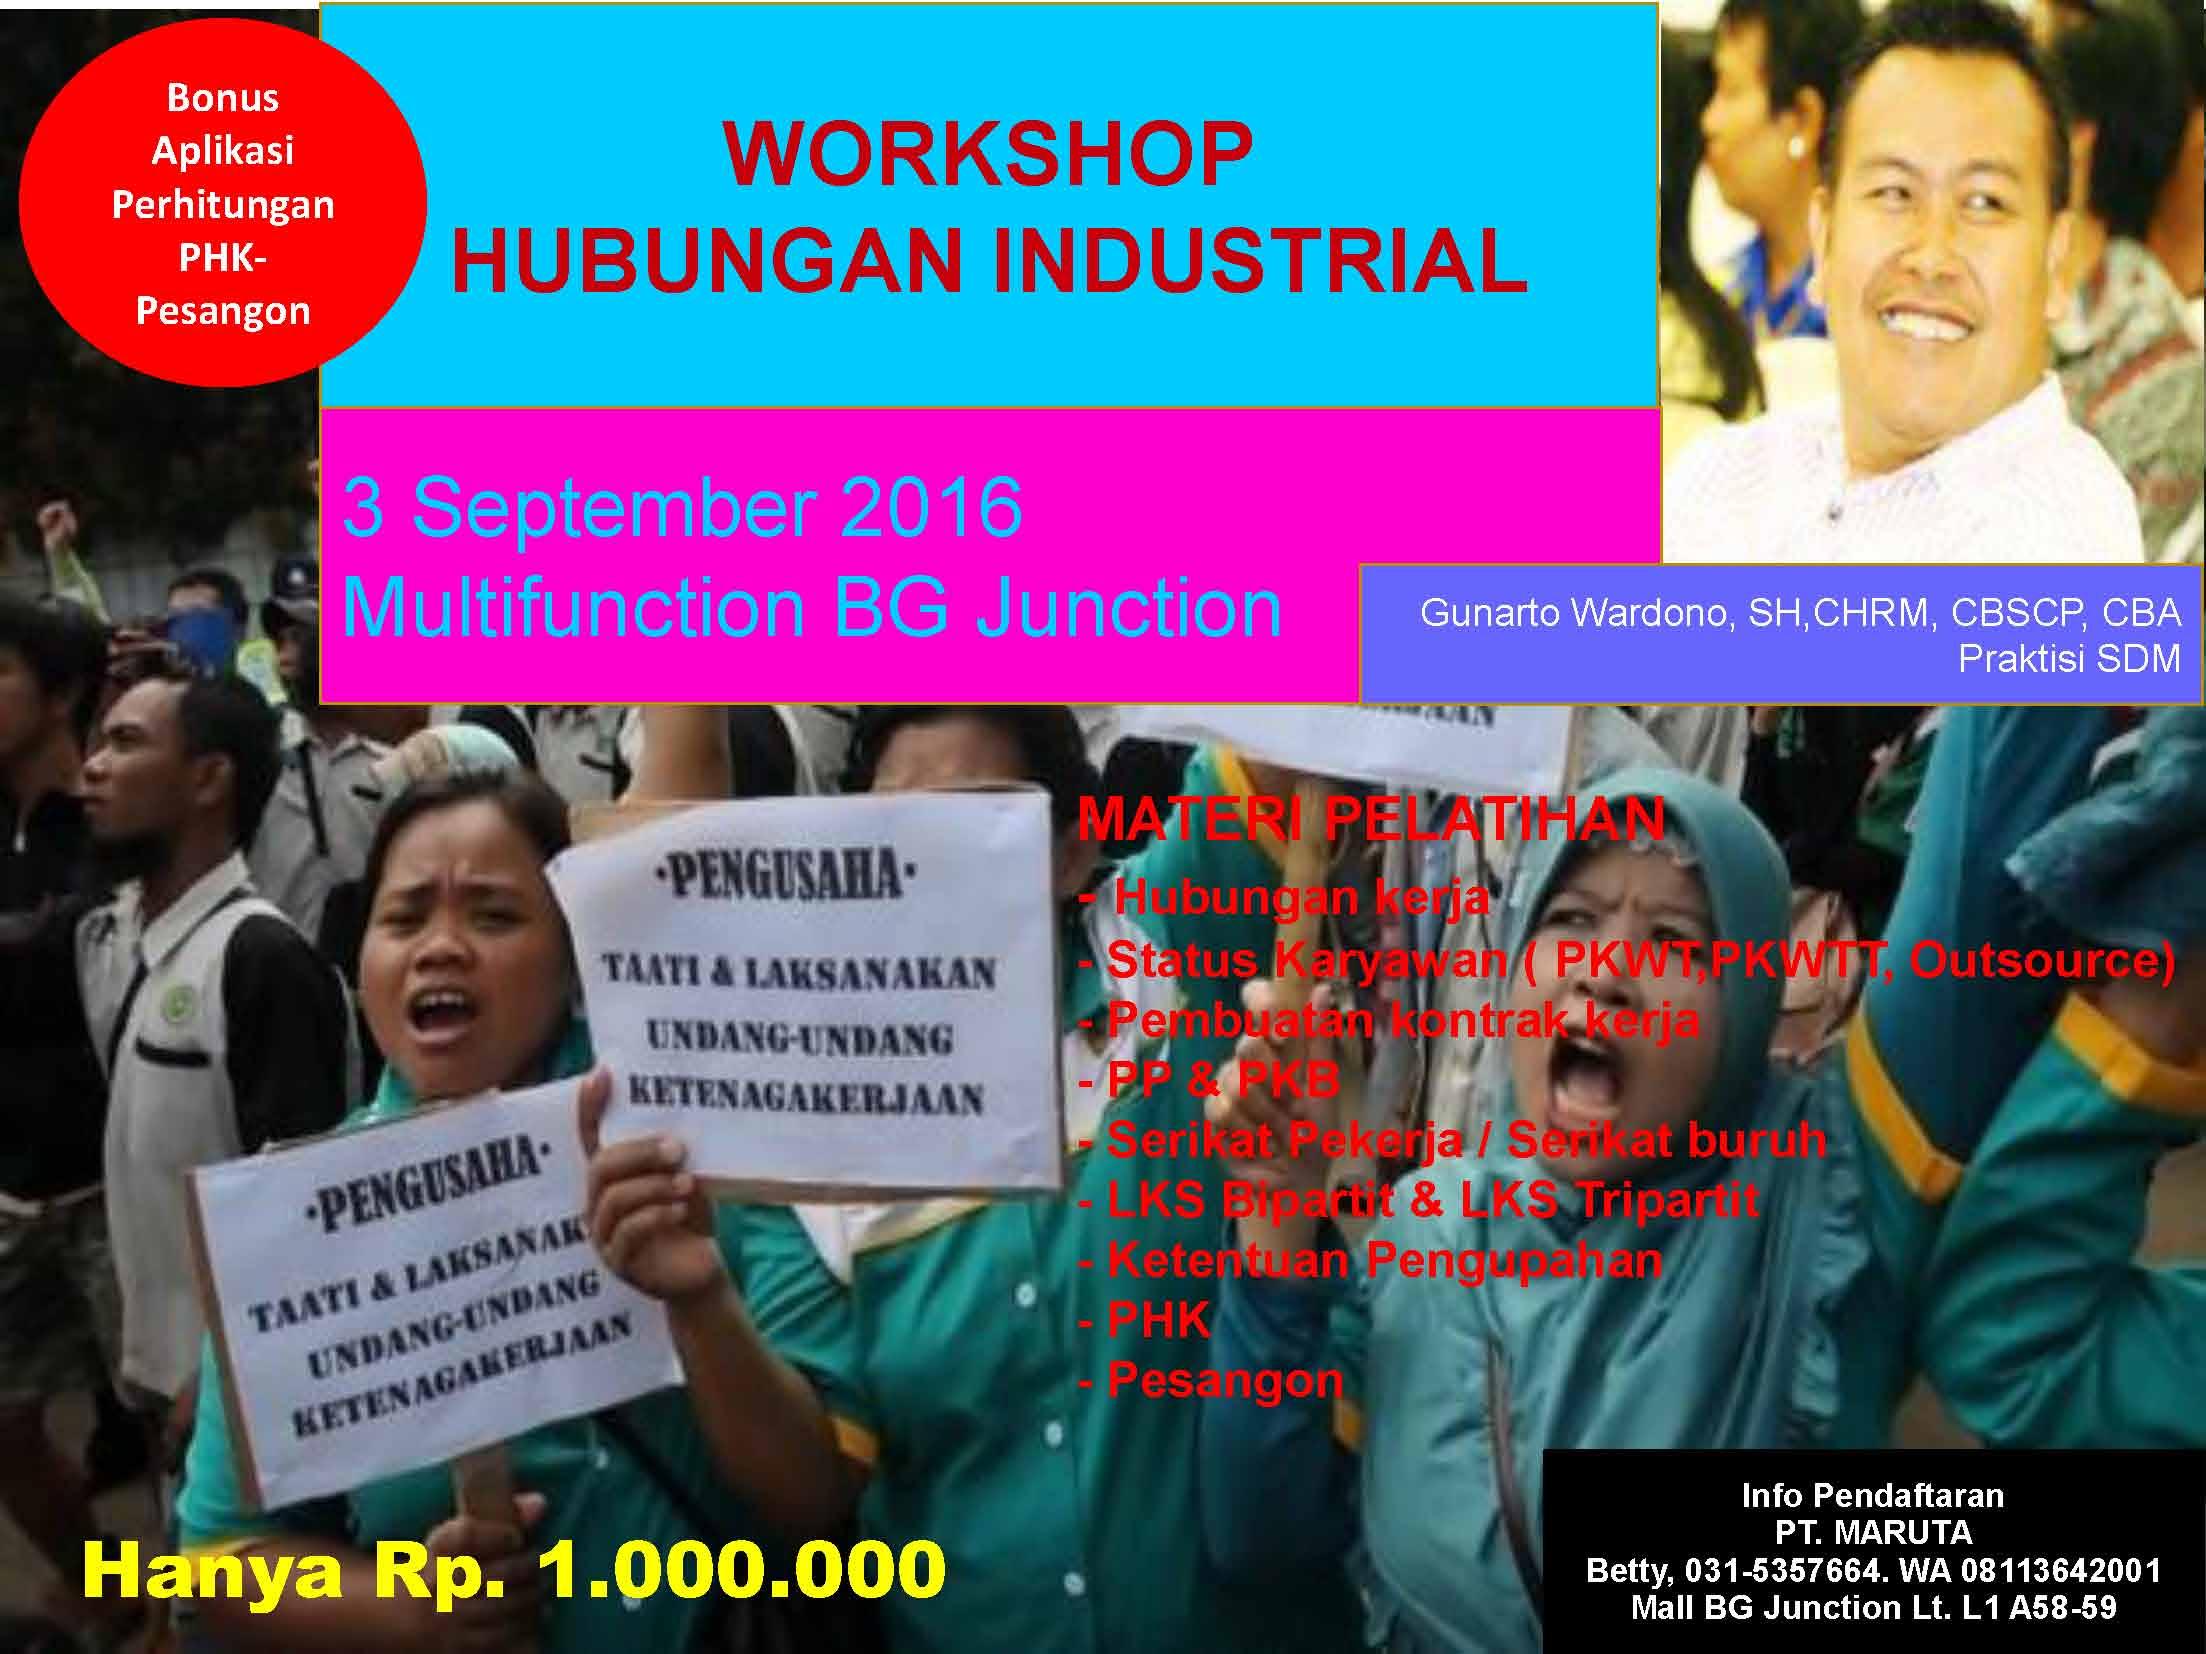 Workshop Hubungan Industrial 3 sept 2016